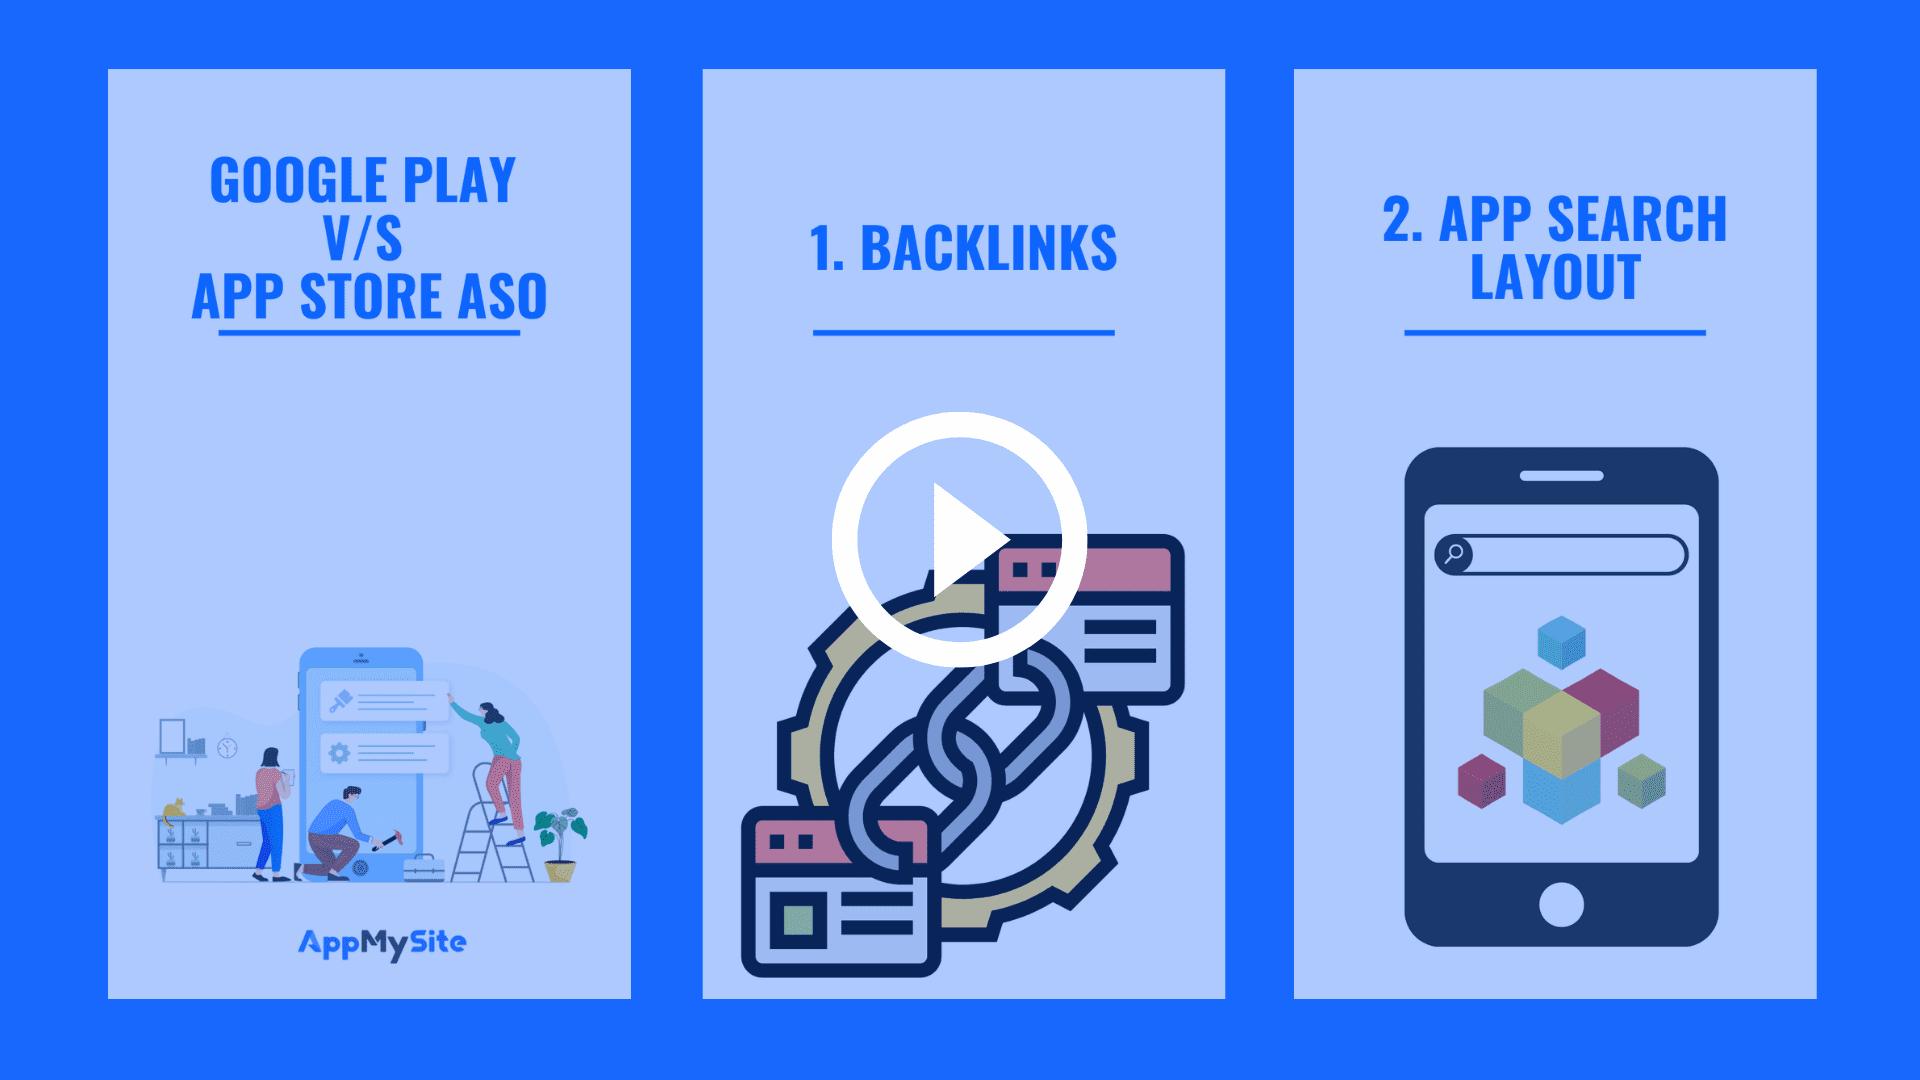 Play store v/s app store ASO